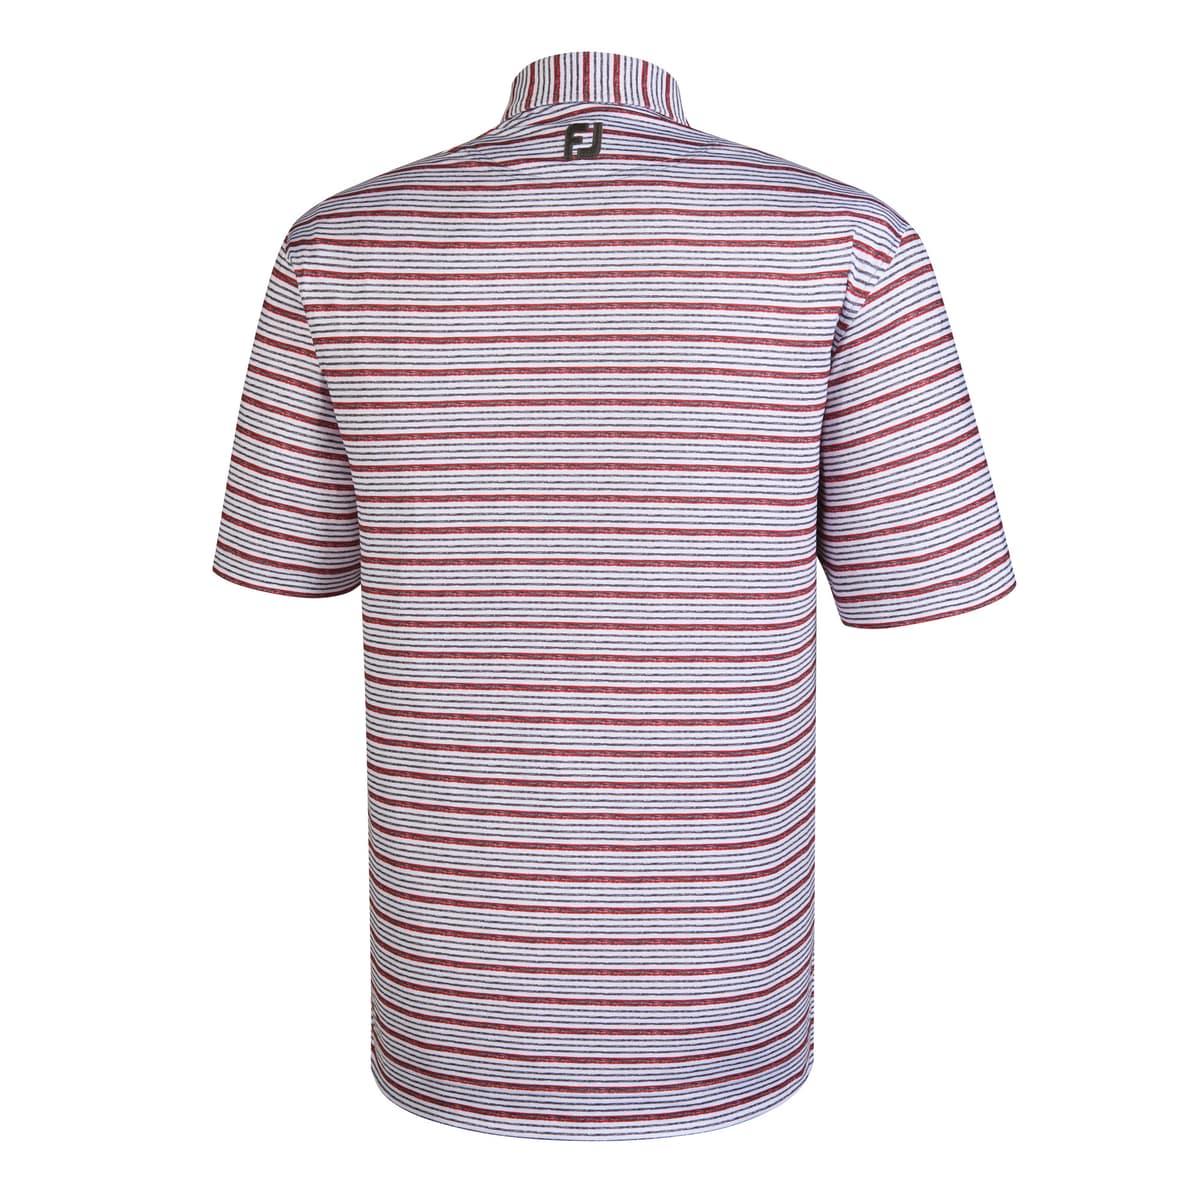 Lisle Space Dye Stripe Self Collar